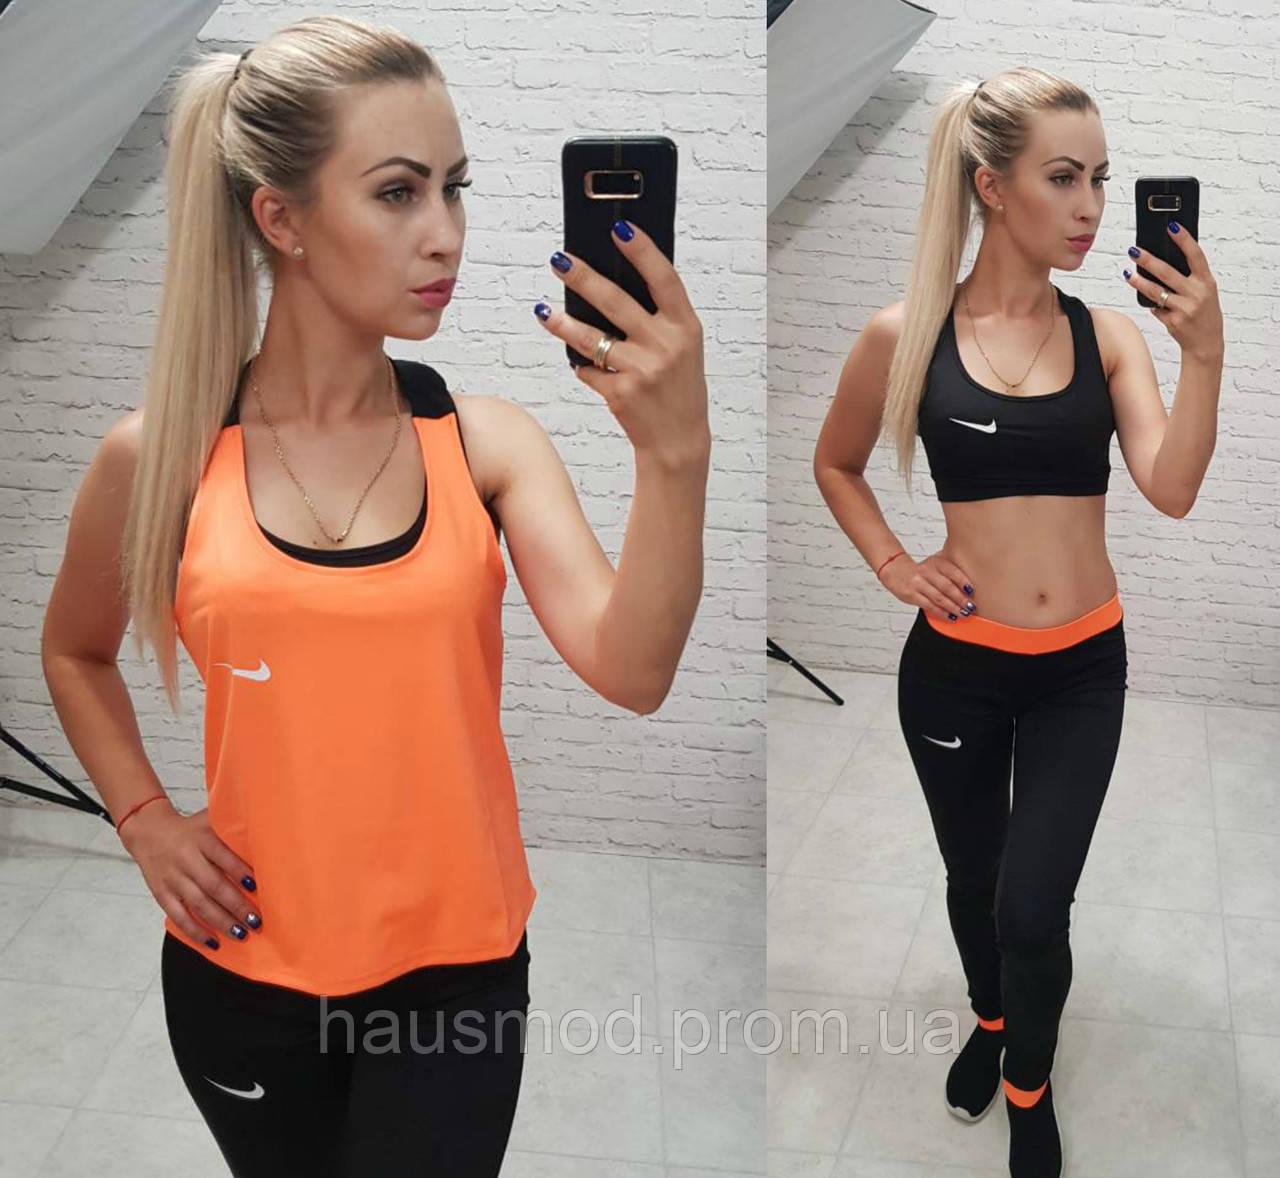 Фитнес костюм 3-ка реплика Nike топ майка лосины микро дайвинг оранжевый